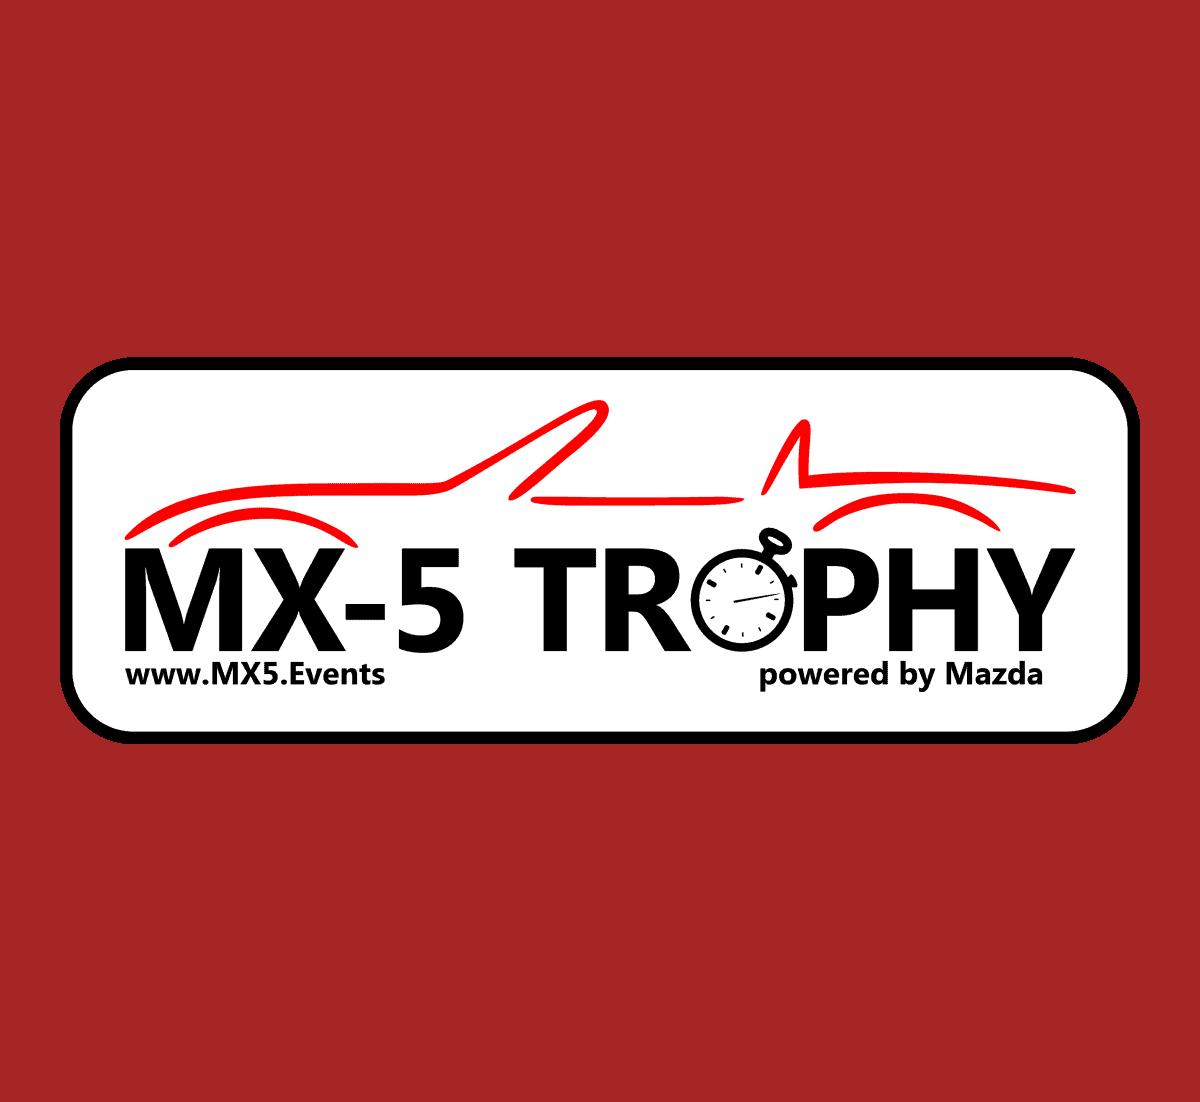 MX5 Trophy 3673x3673 1